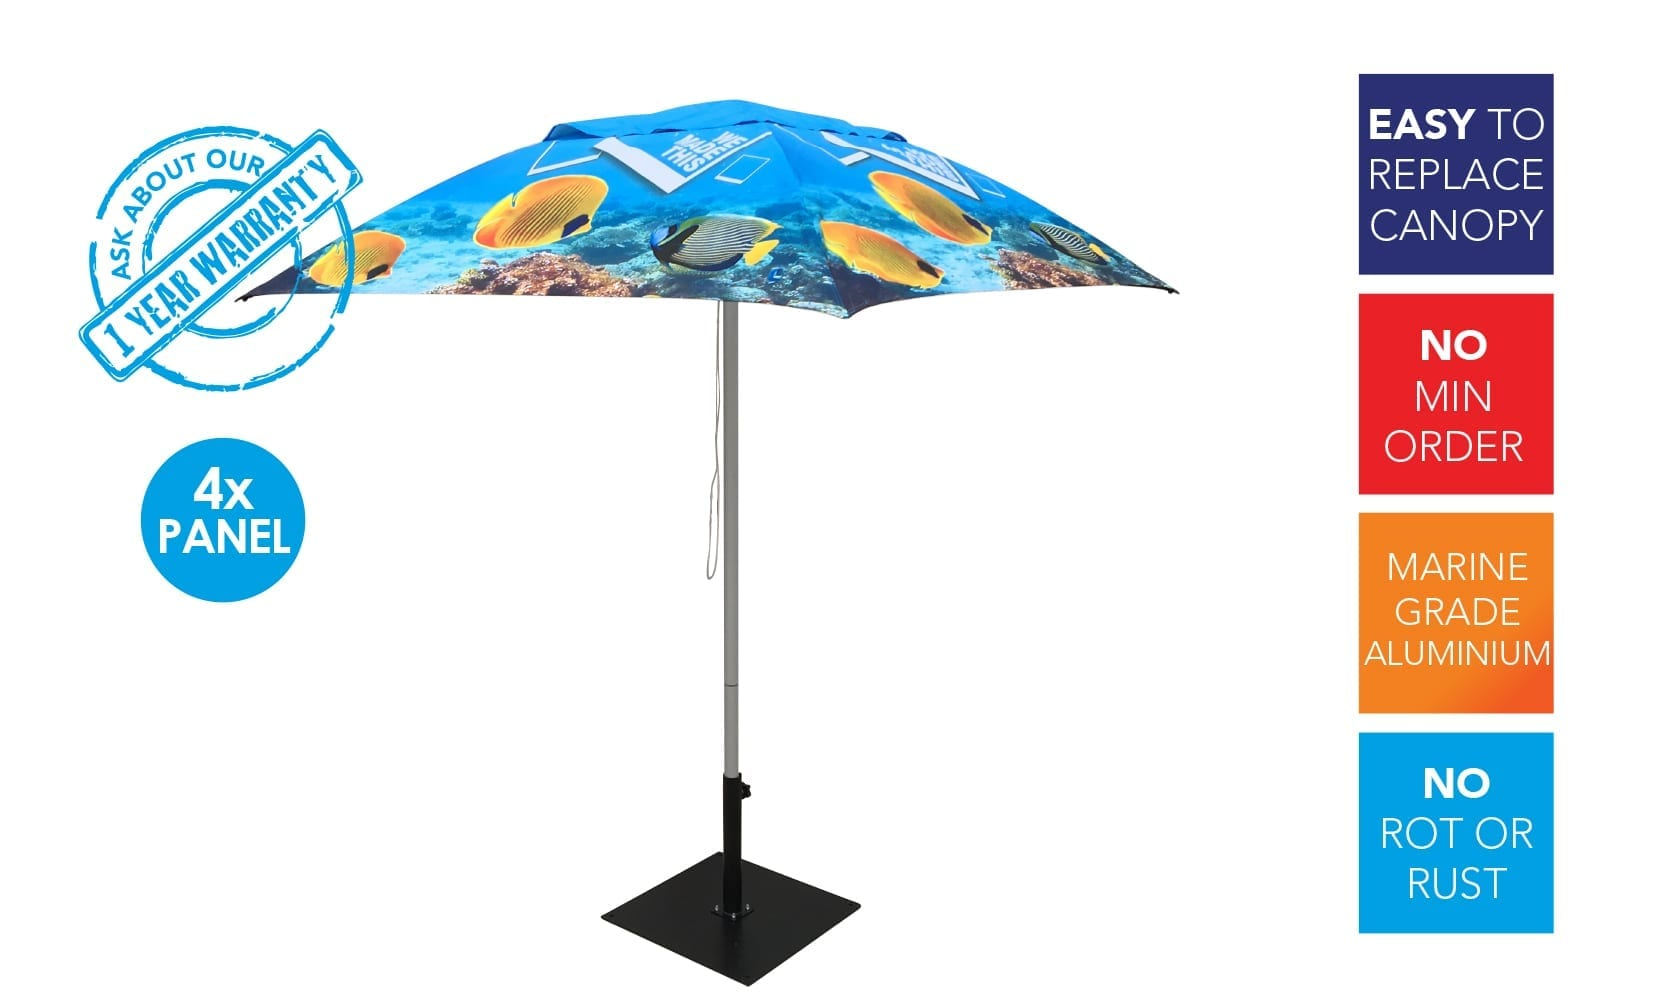 ExpandaBrand Printed Market Umbrellas Sydney